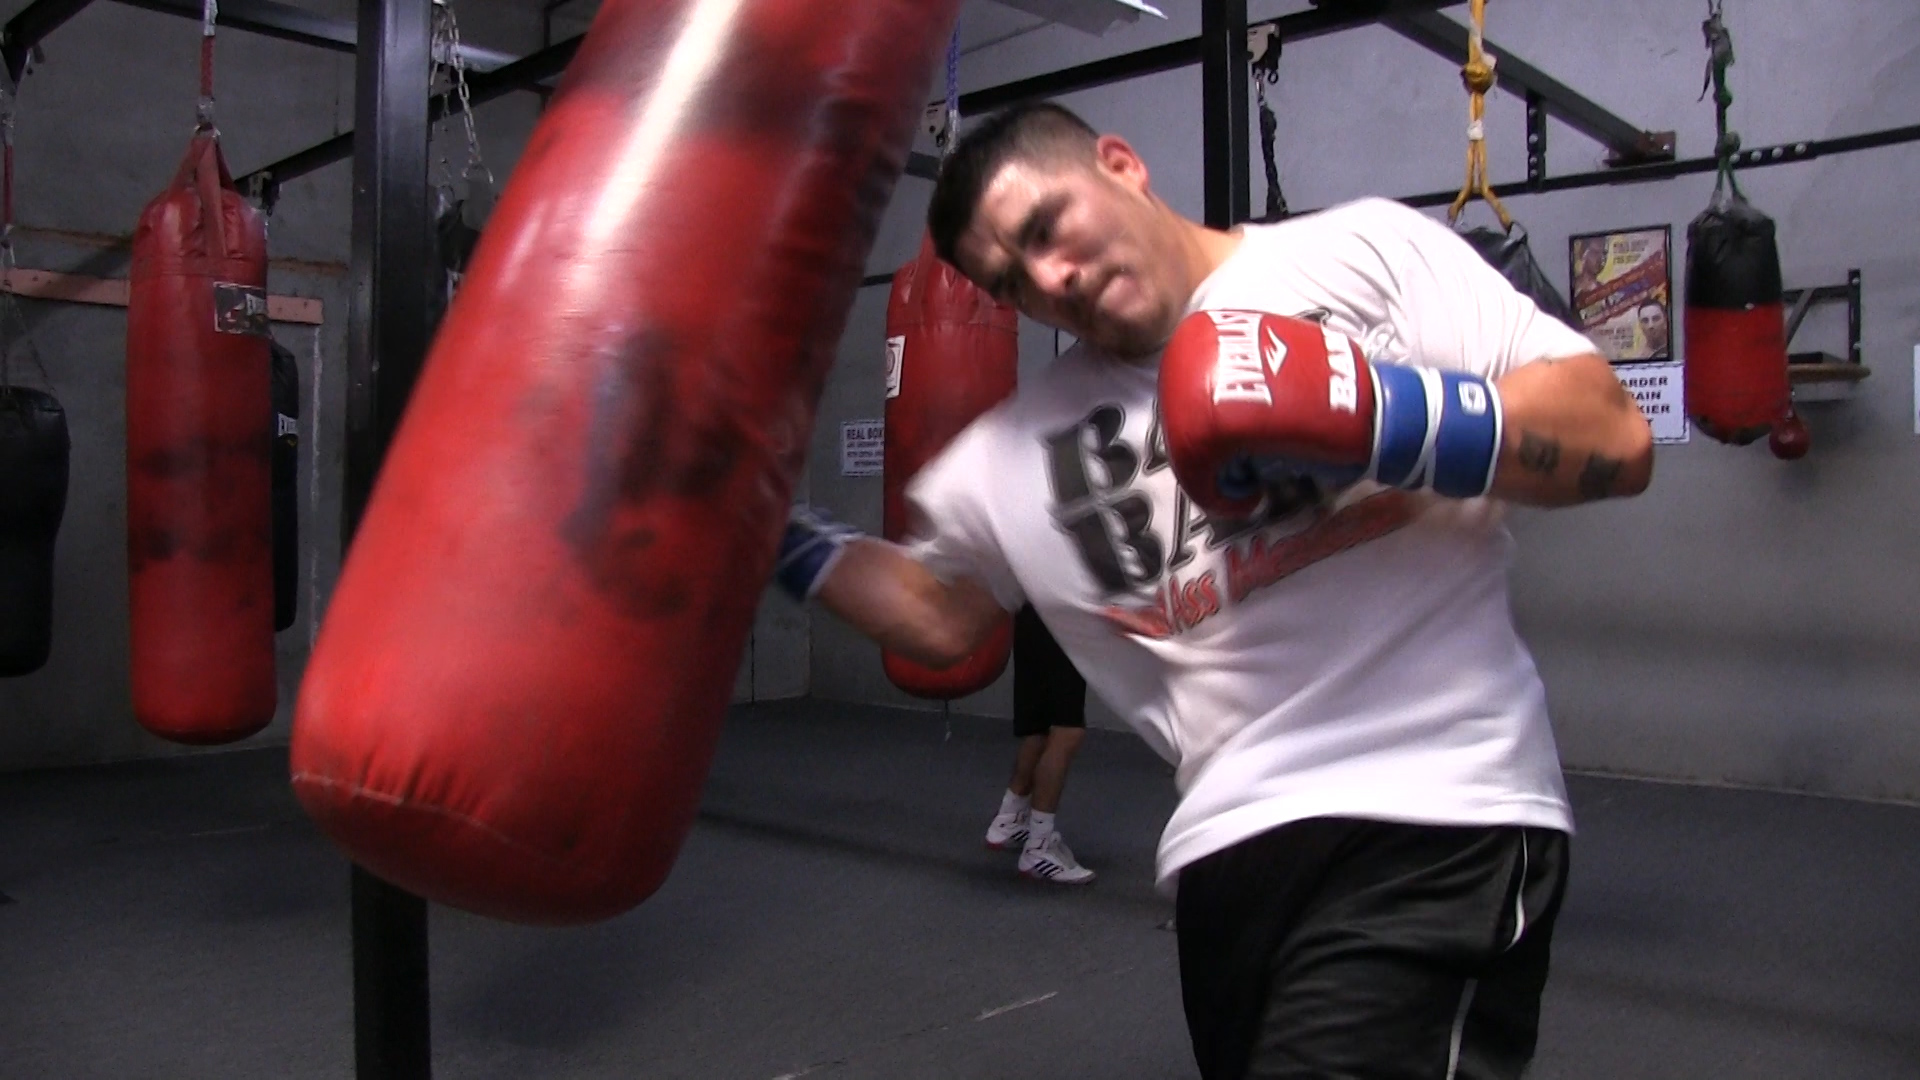 http://www.fighthubtv.com/wp-content/uploads/2013/10/00212.MTS_.Still001.jpg